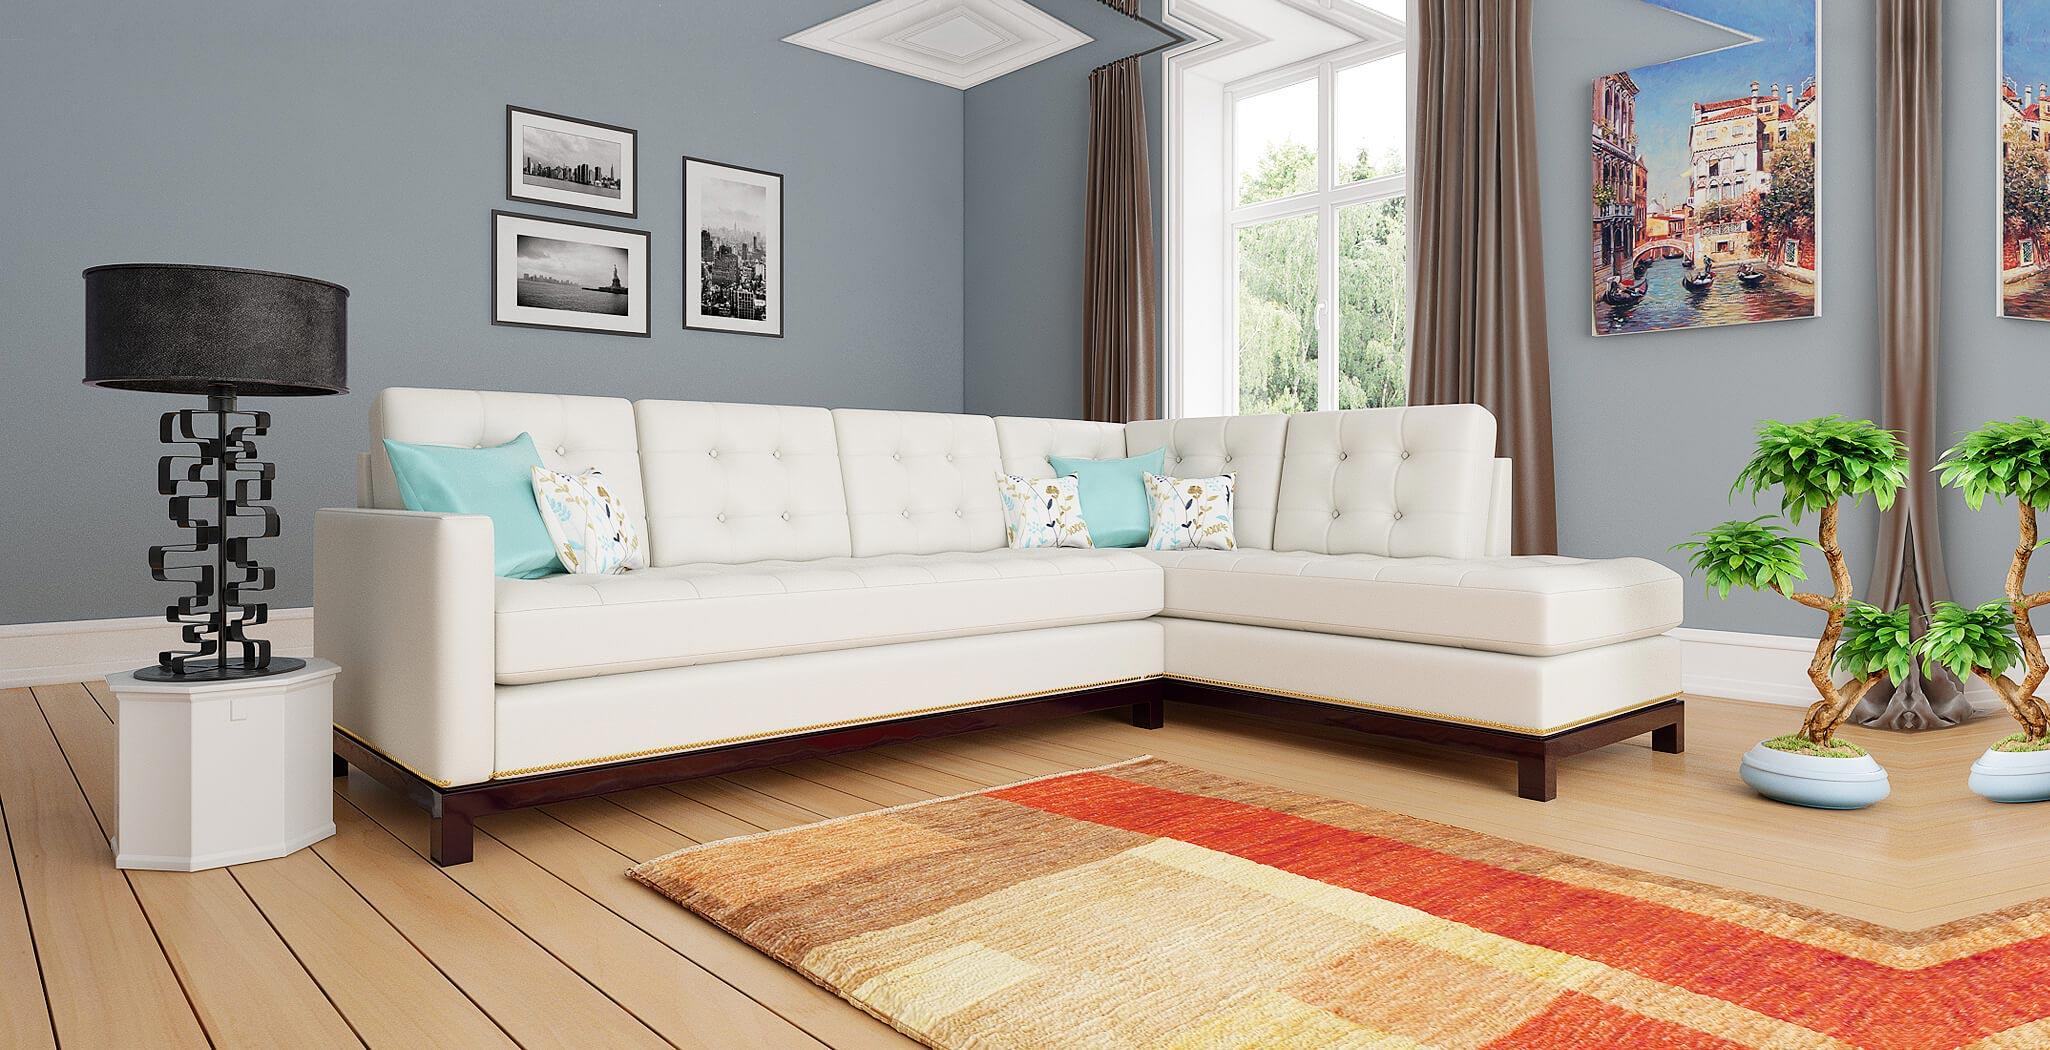 davos panel furniture gallery 4